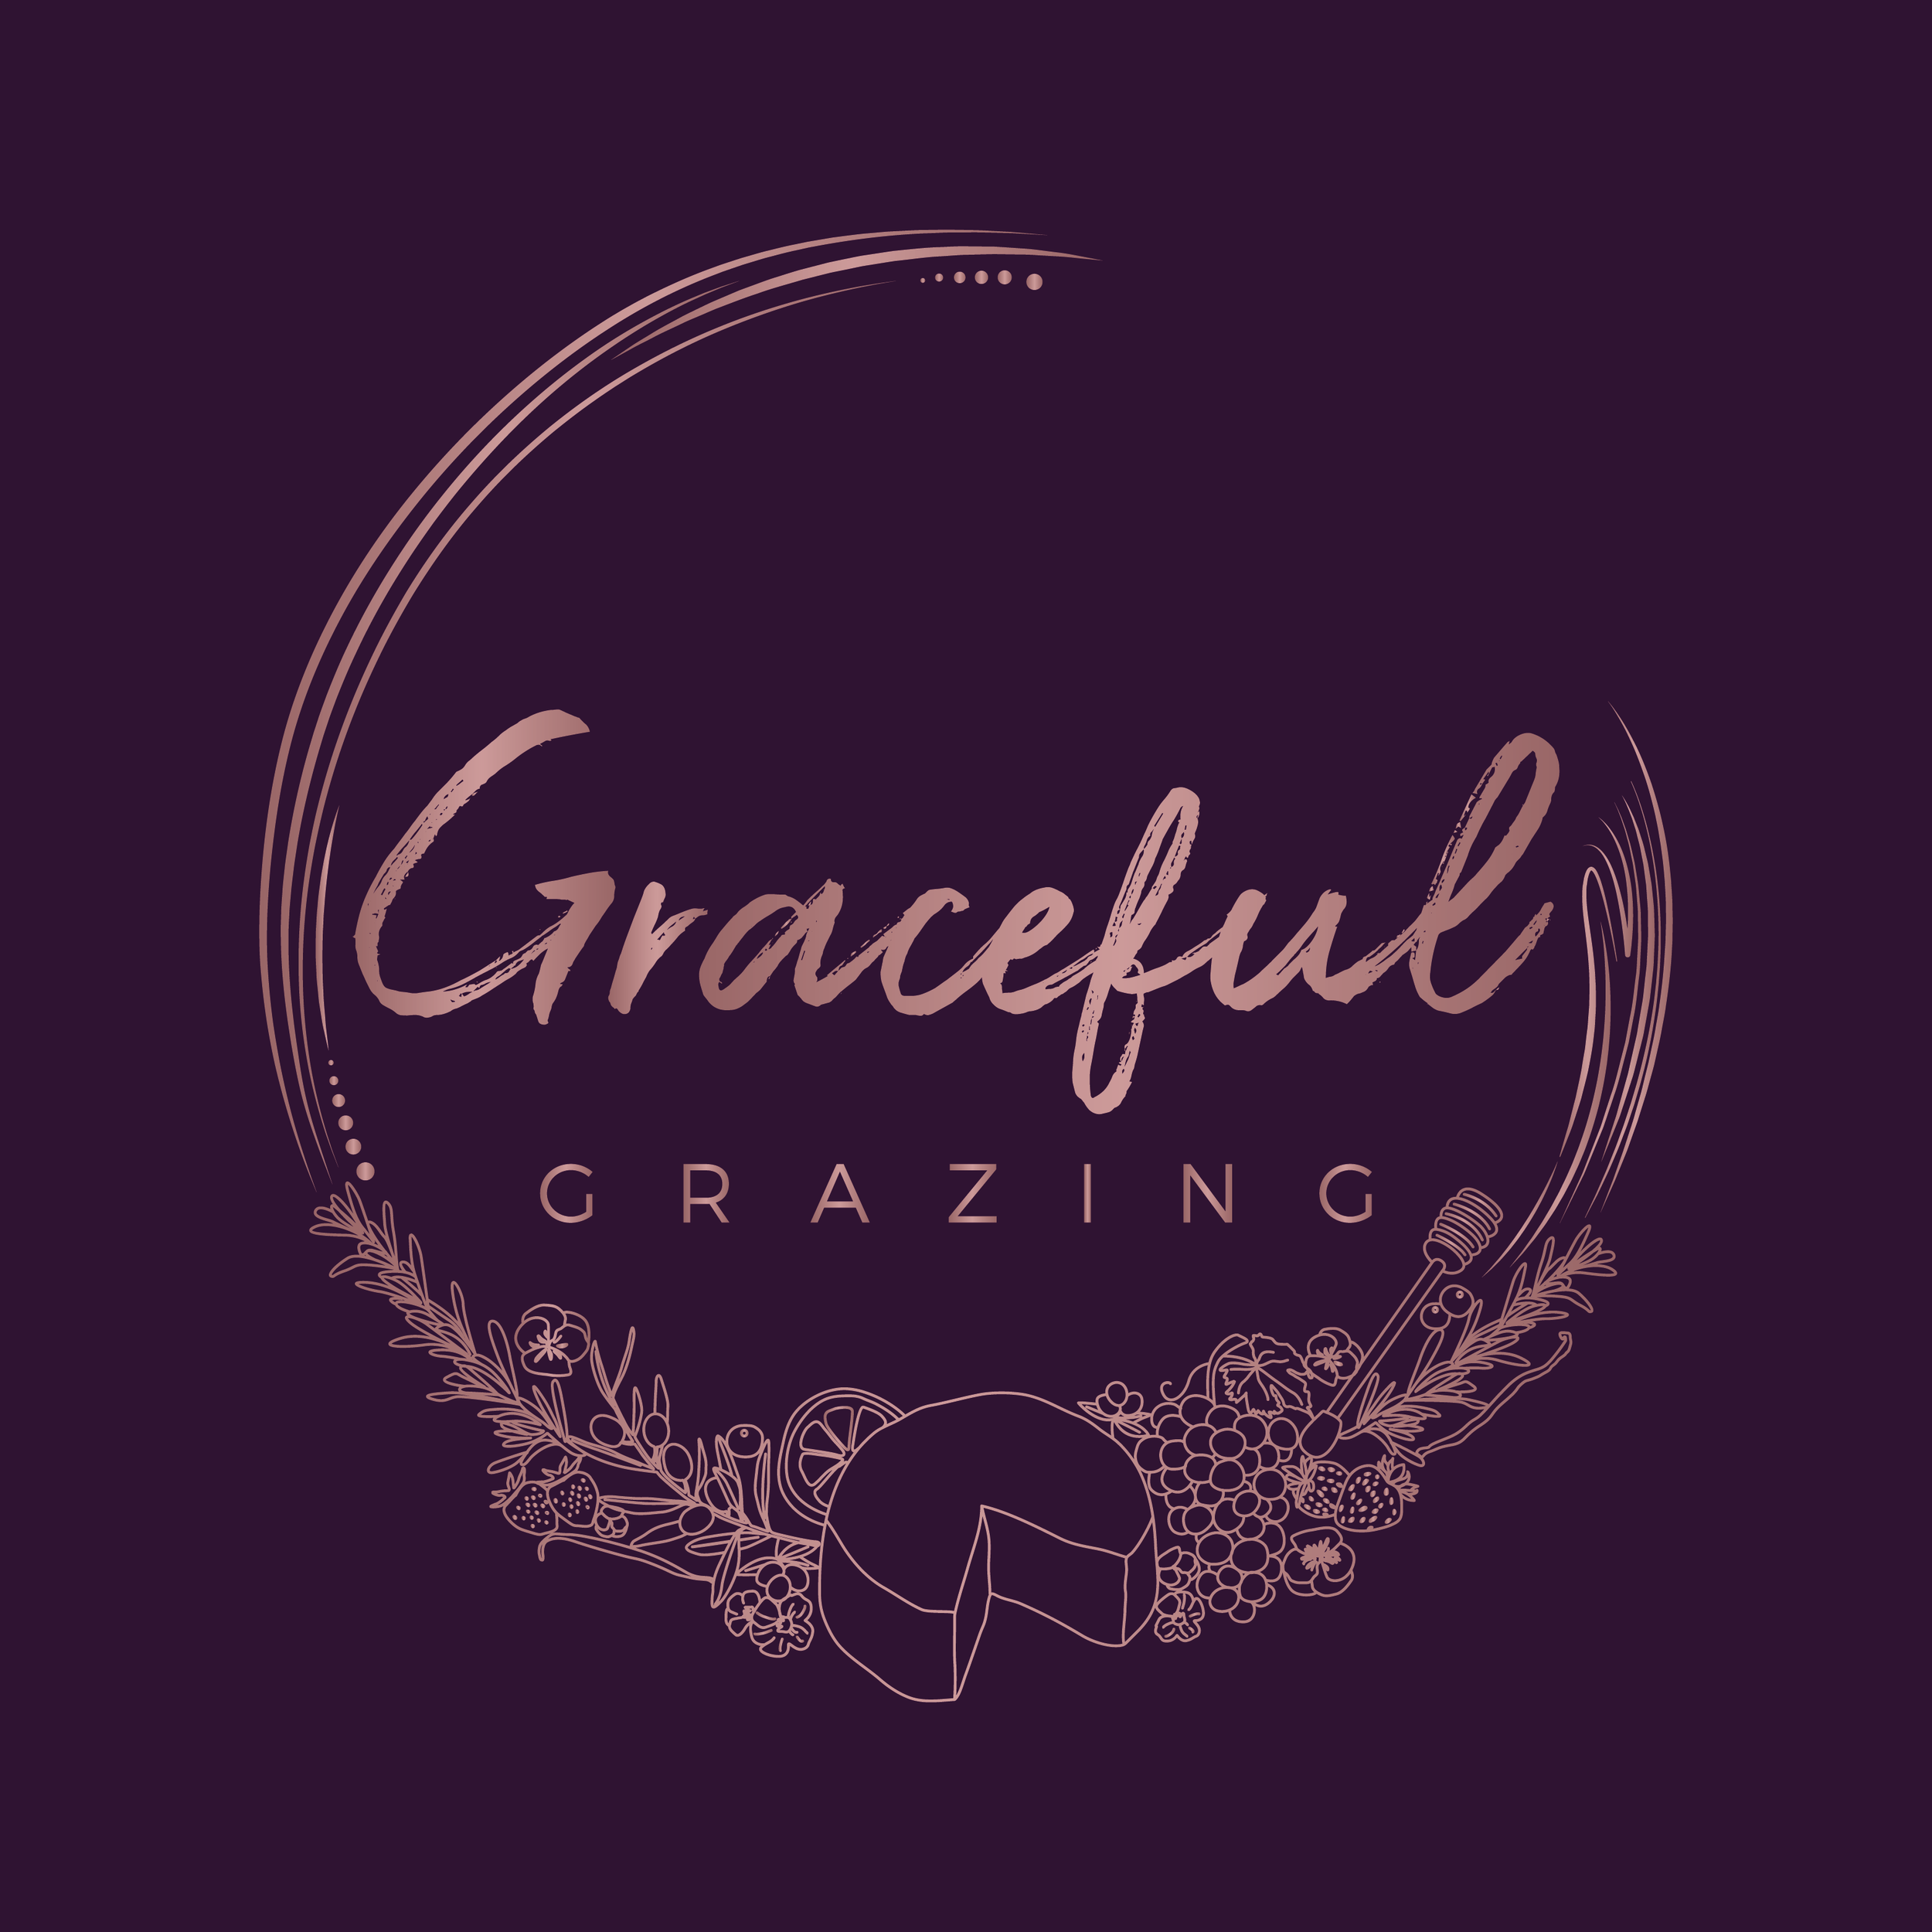 Graceful Grazing